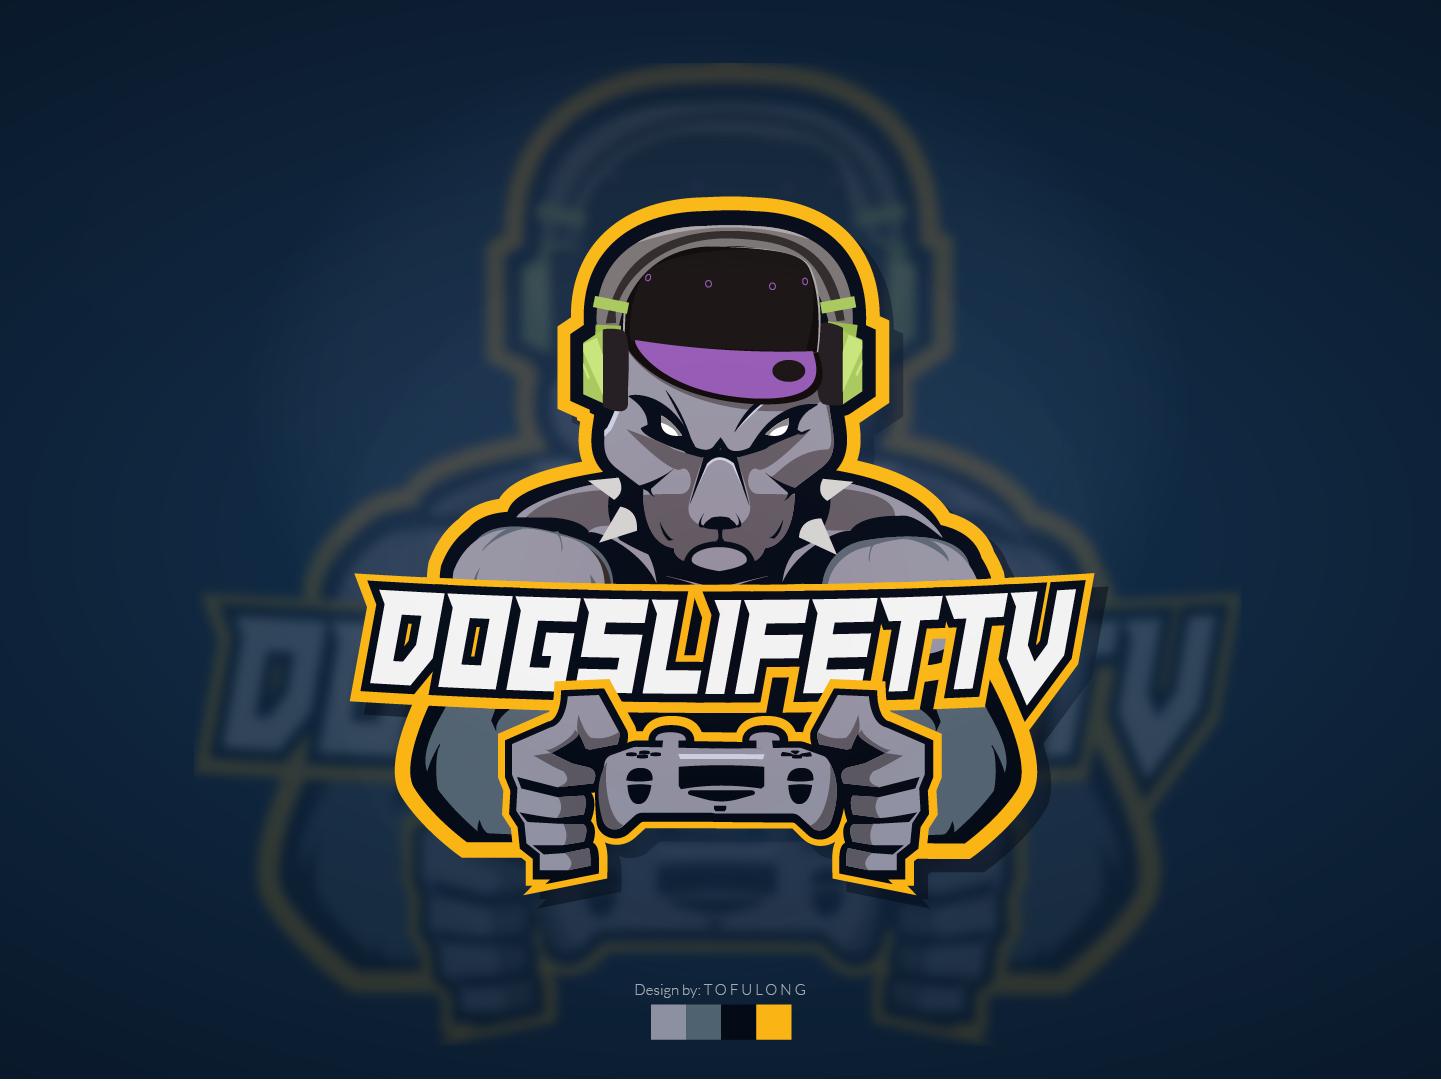 Dog man/Minotaur Style Mascot Logo Twitch/Esports 2d vector gaminglogo illustration mascotlogo dog logo psgang controller dogman progamer esportslogo twitchlogo twitch esports razer playstation4 doggy minotaur dog